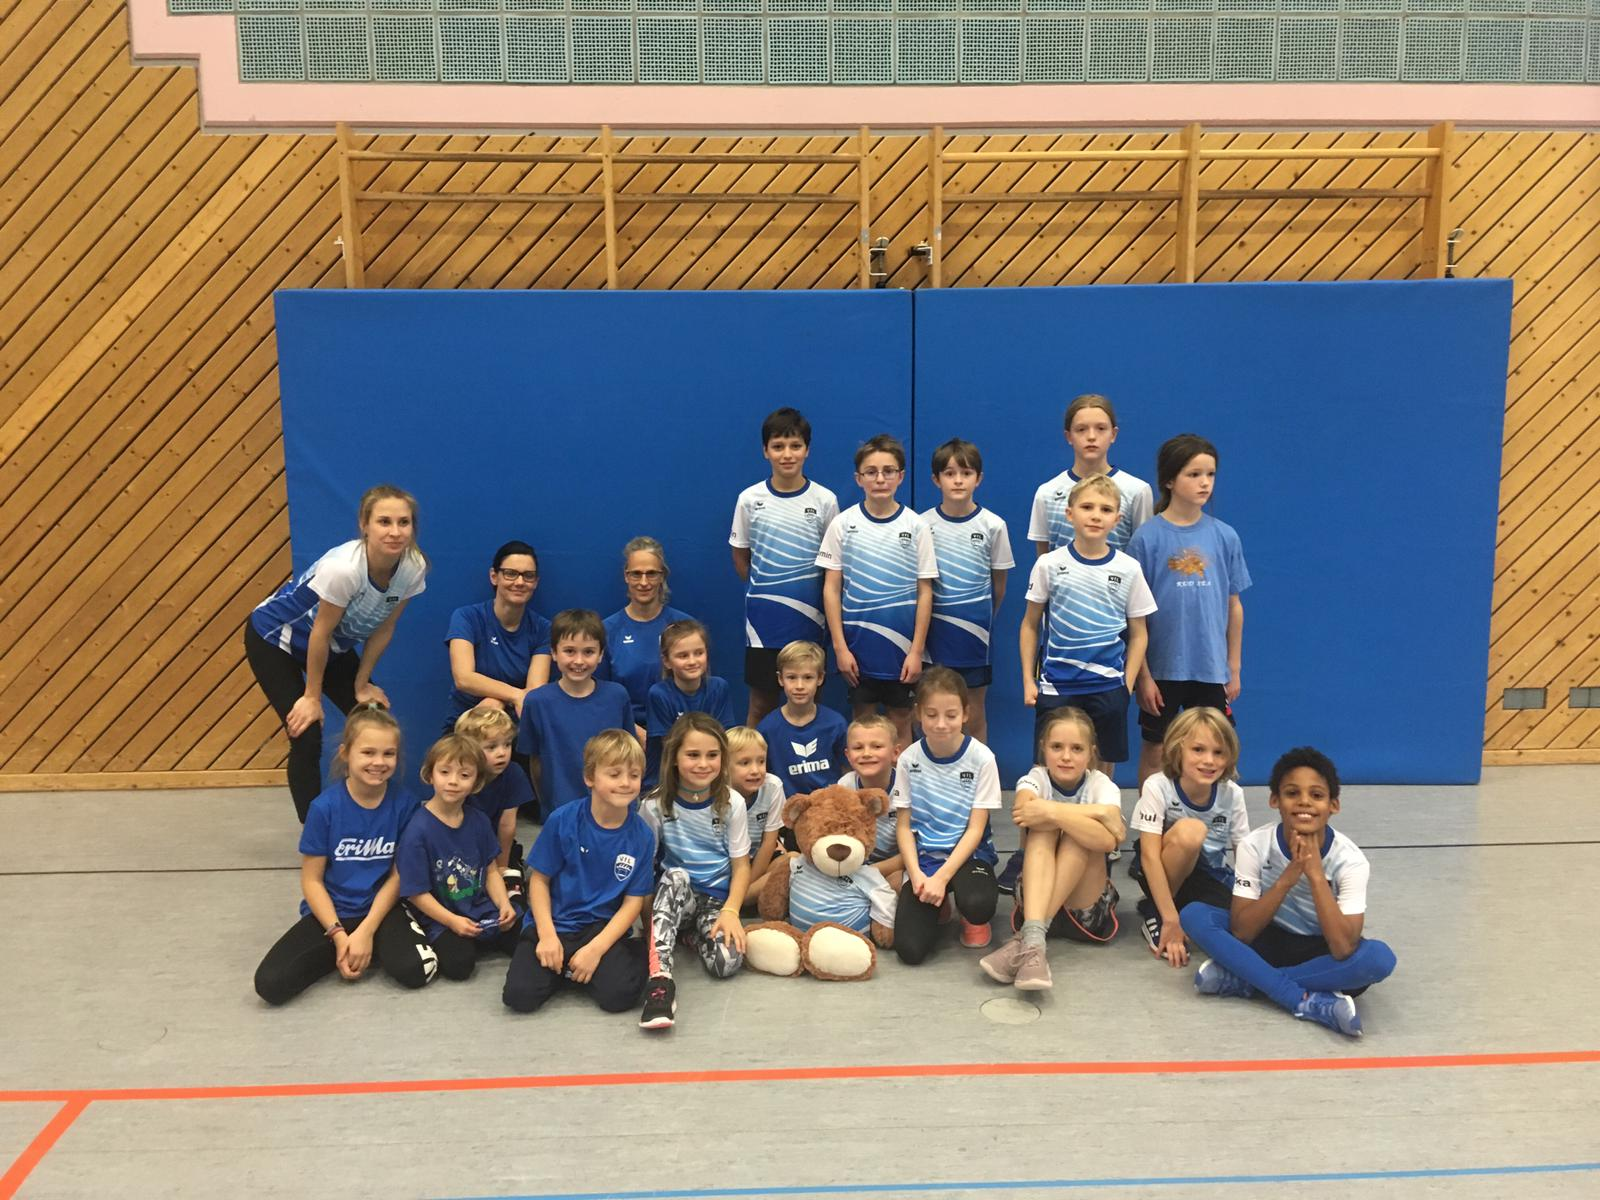 VfL Pfullingen Leichtathletik Kinderleichtathletik